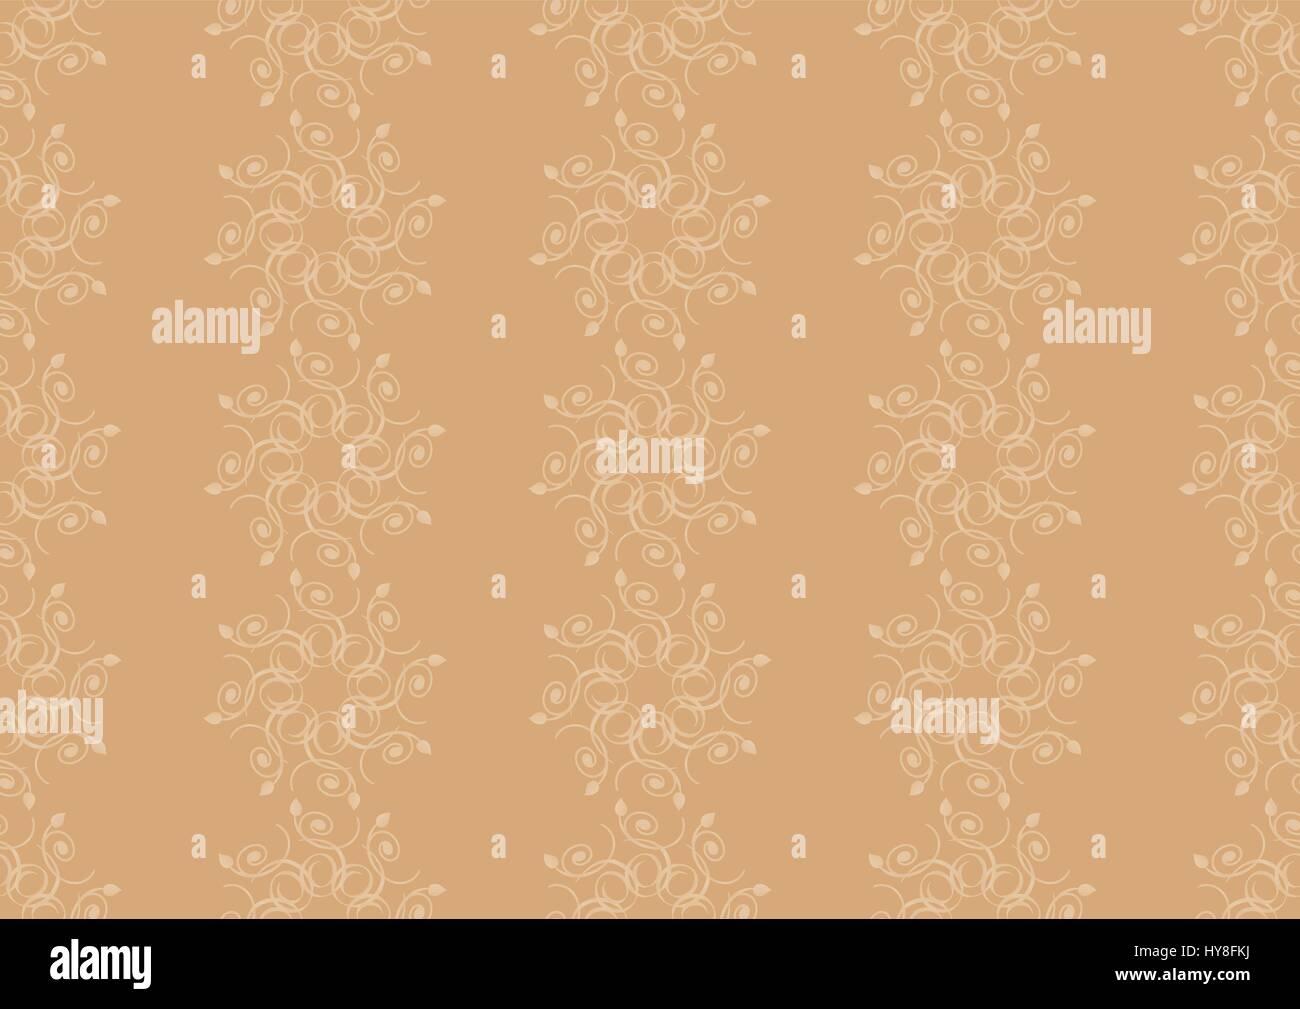 Seamless wallpaper pattern - Stock Image